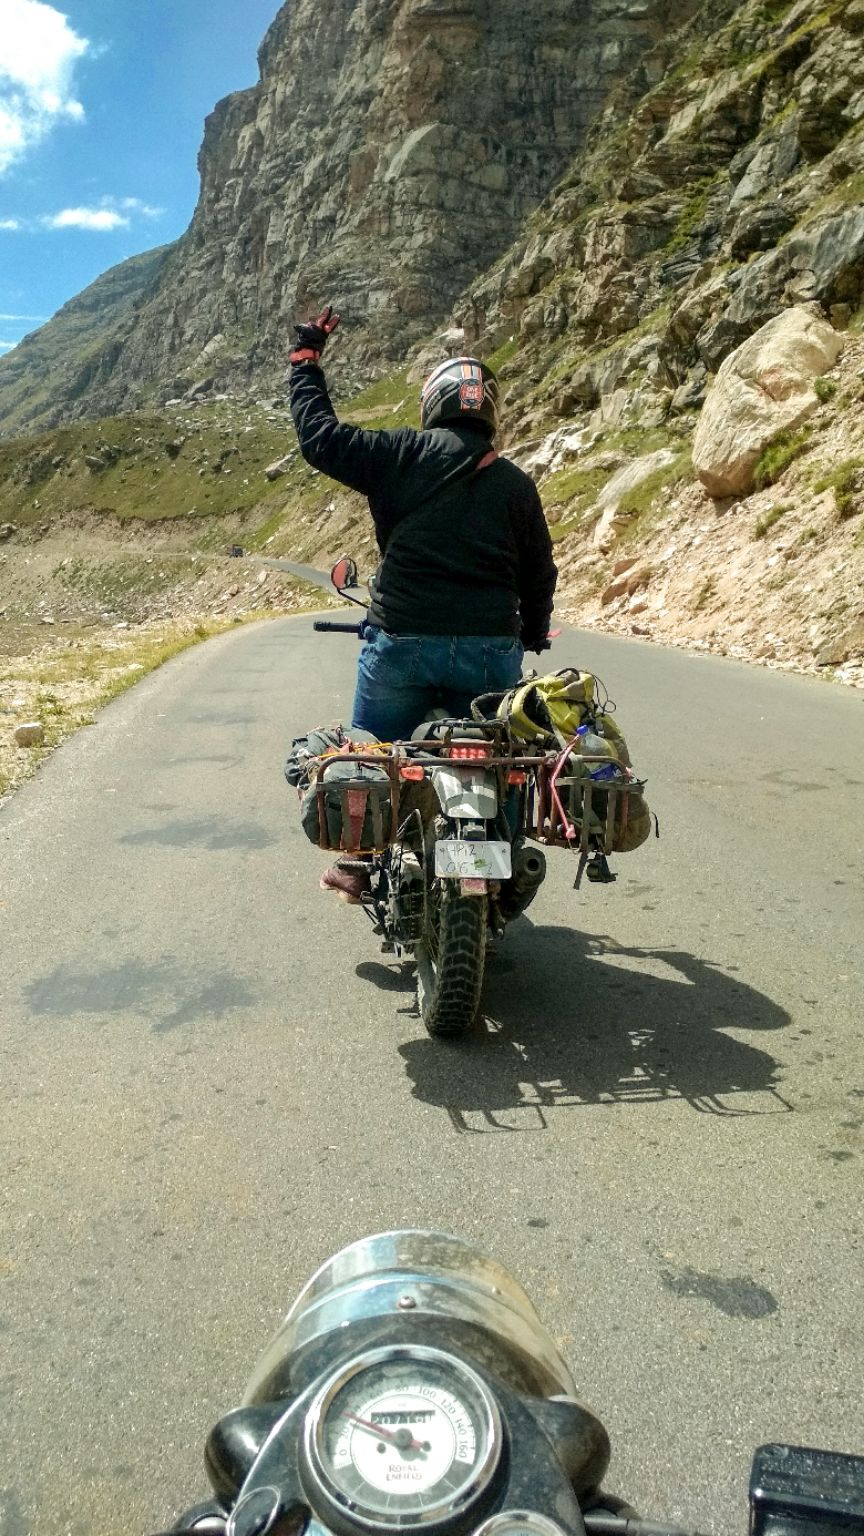 Photo of Himachal pradesh By ijazalfa